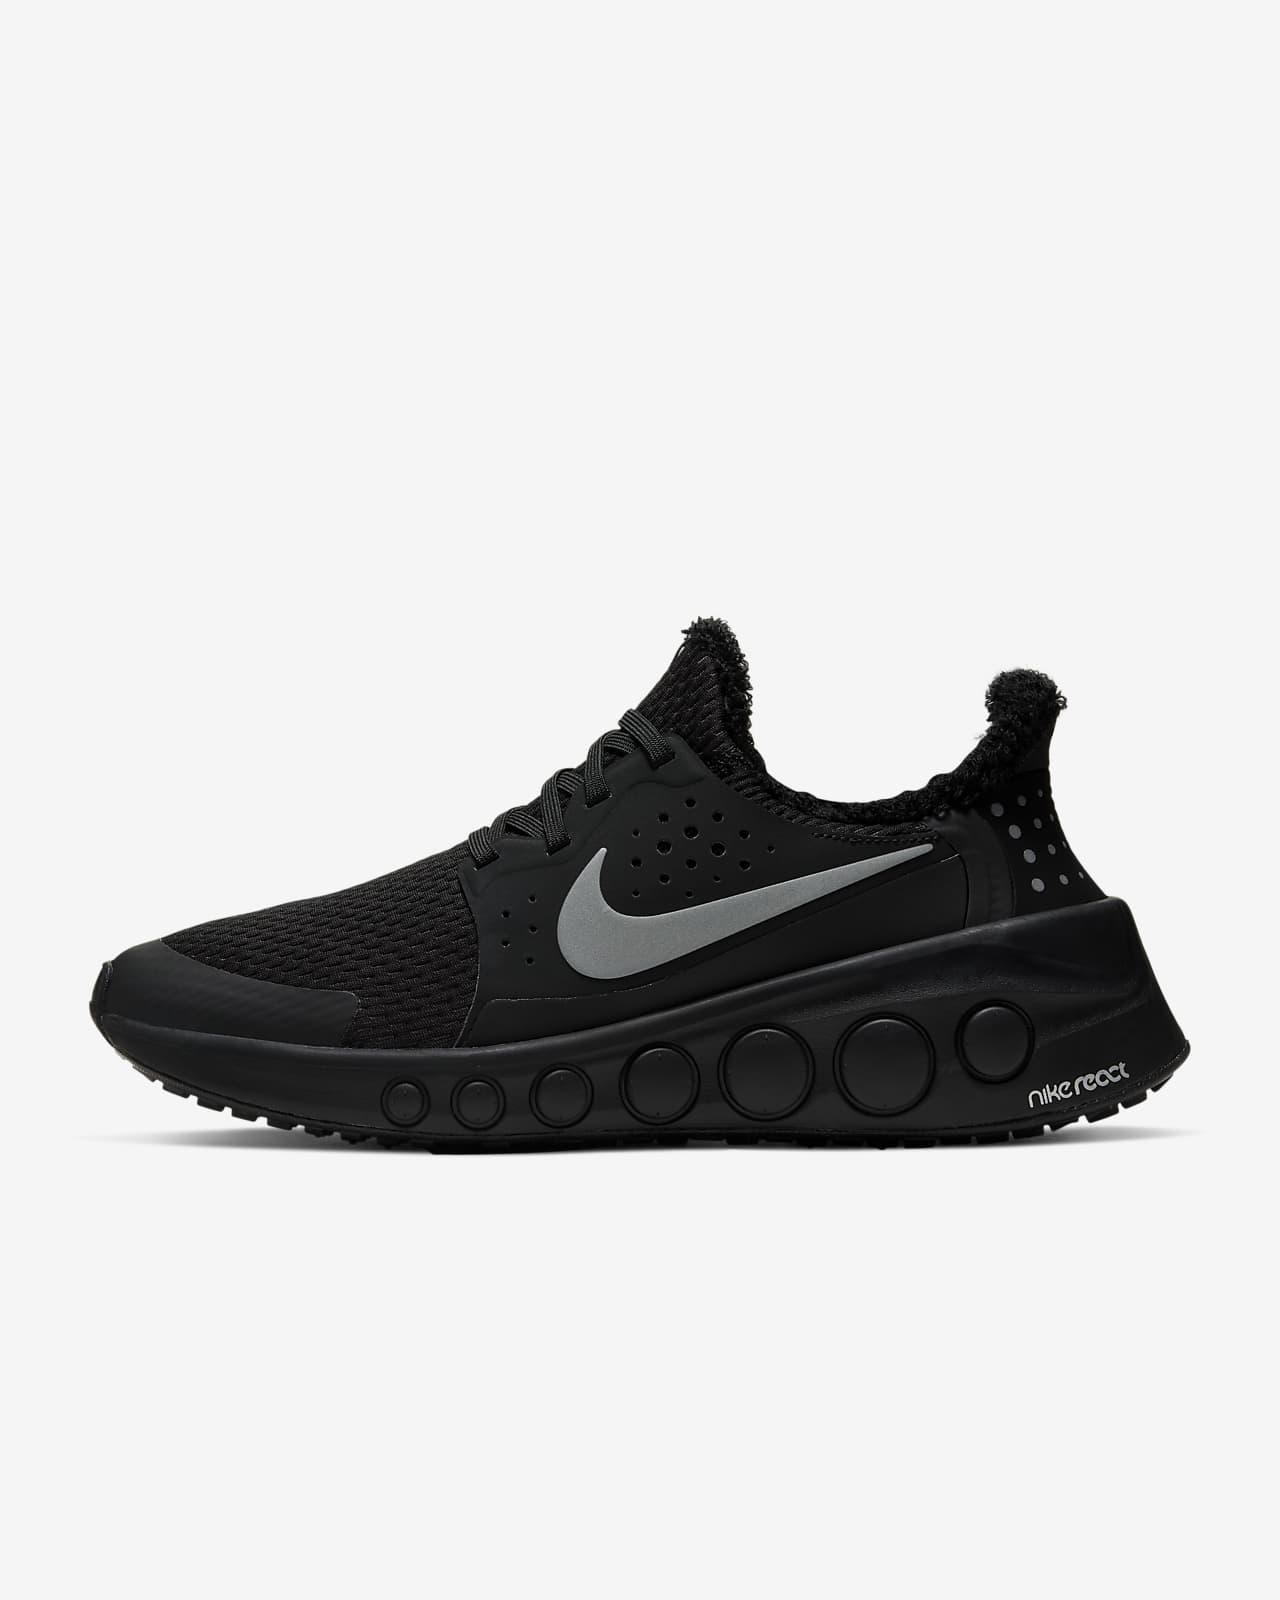 Nike CruzrOne (Triple Black) Shoe. Nike.com